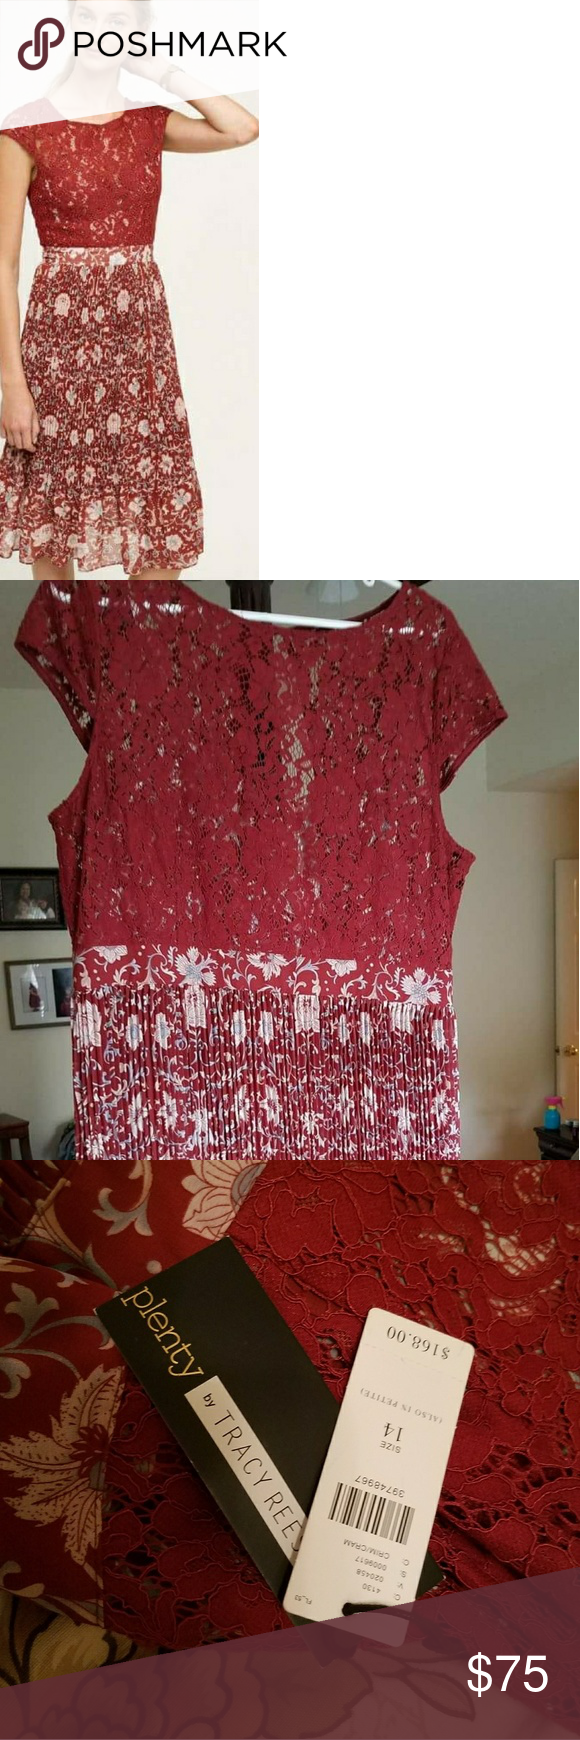 a287b0dc252f Tracy Reese Arcadia dress NWT | My Posh Picks